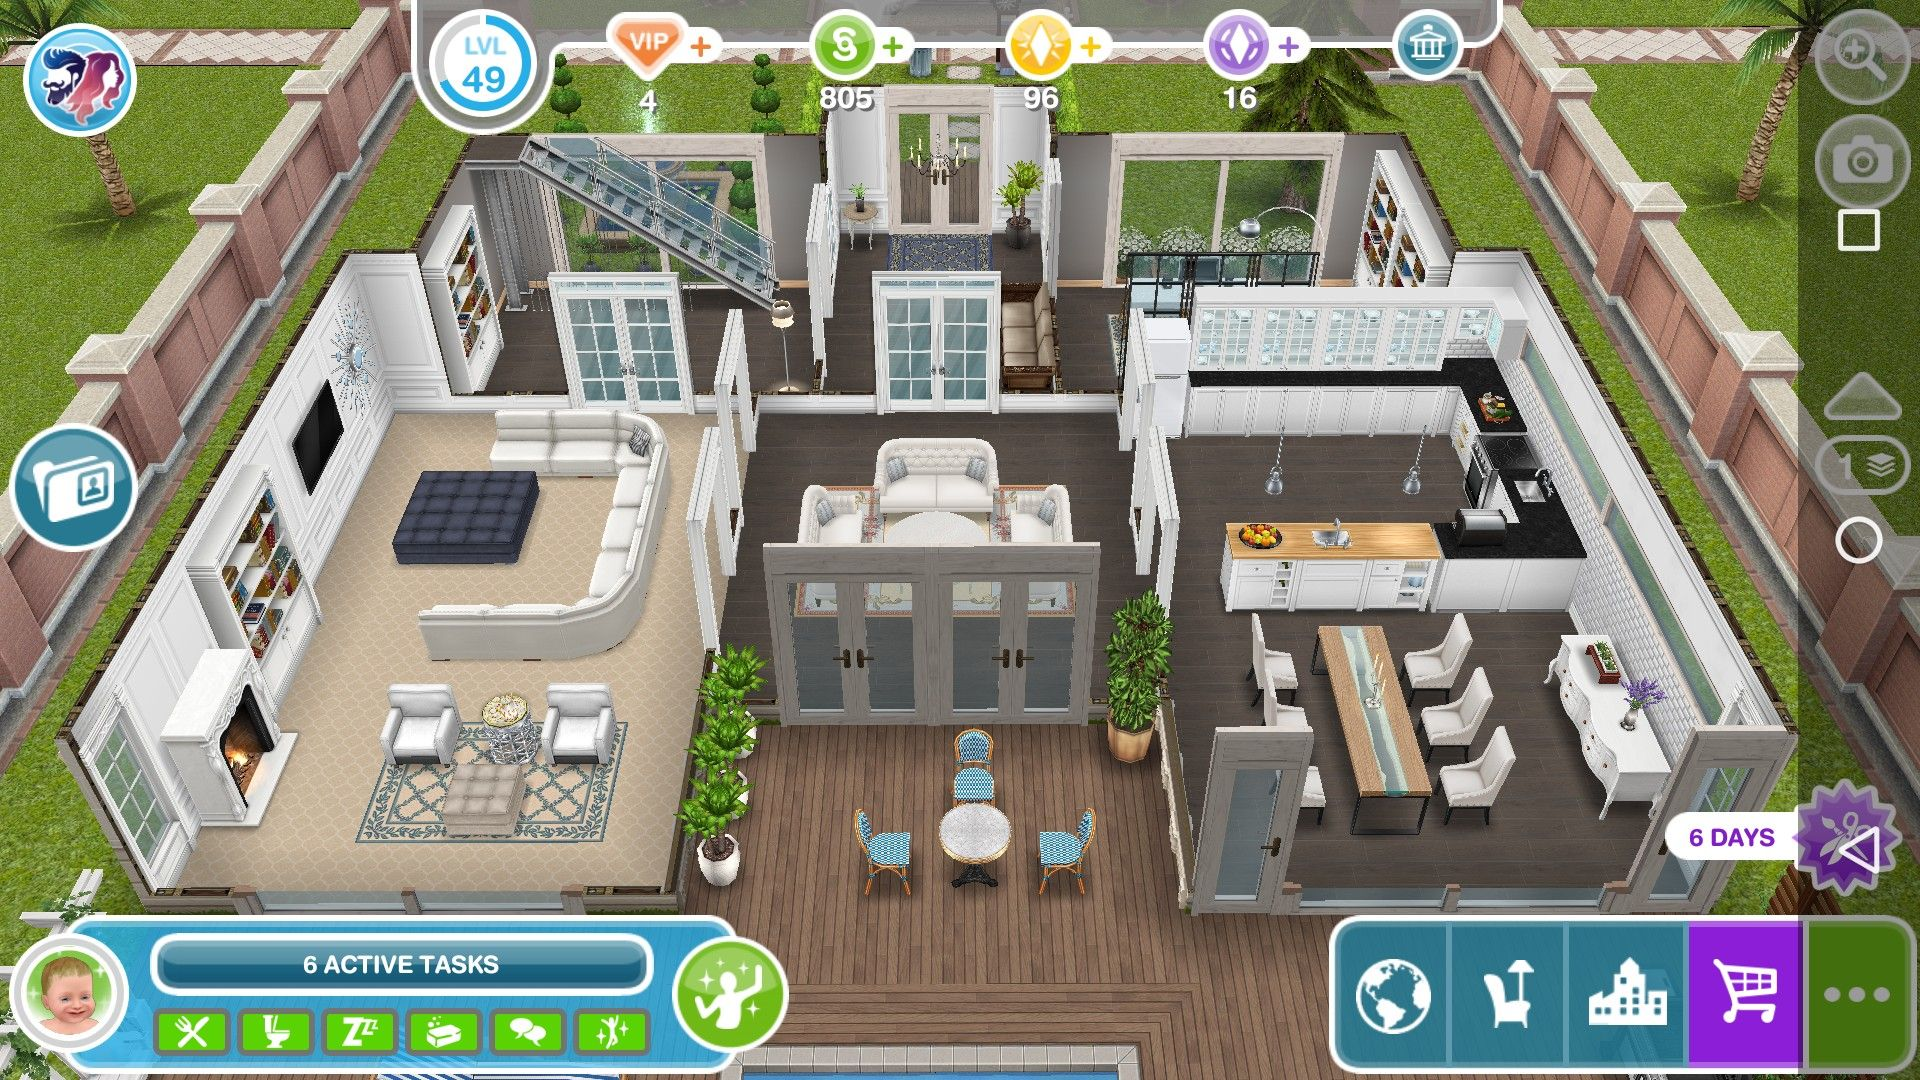 Sims 4 Free Play